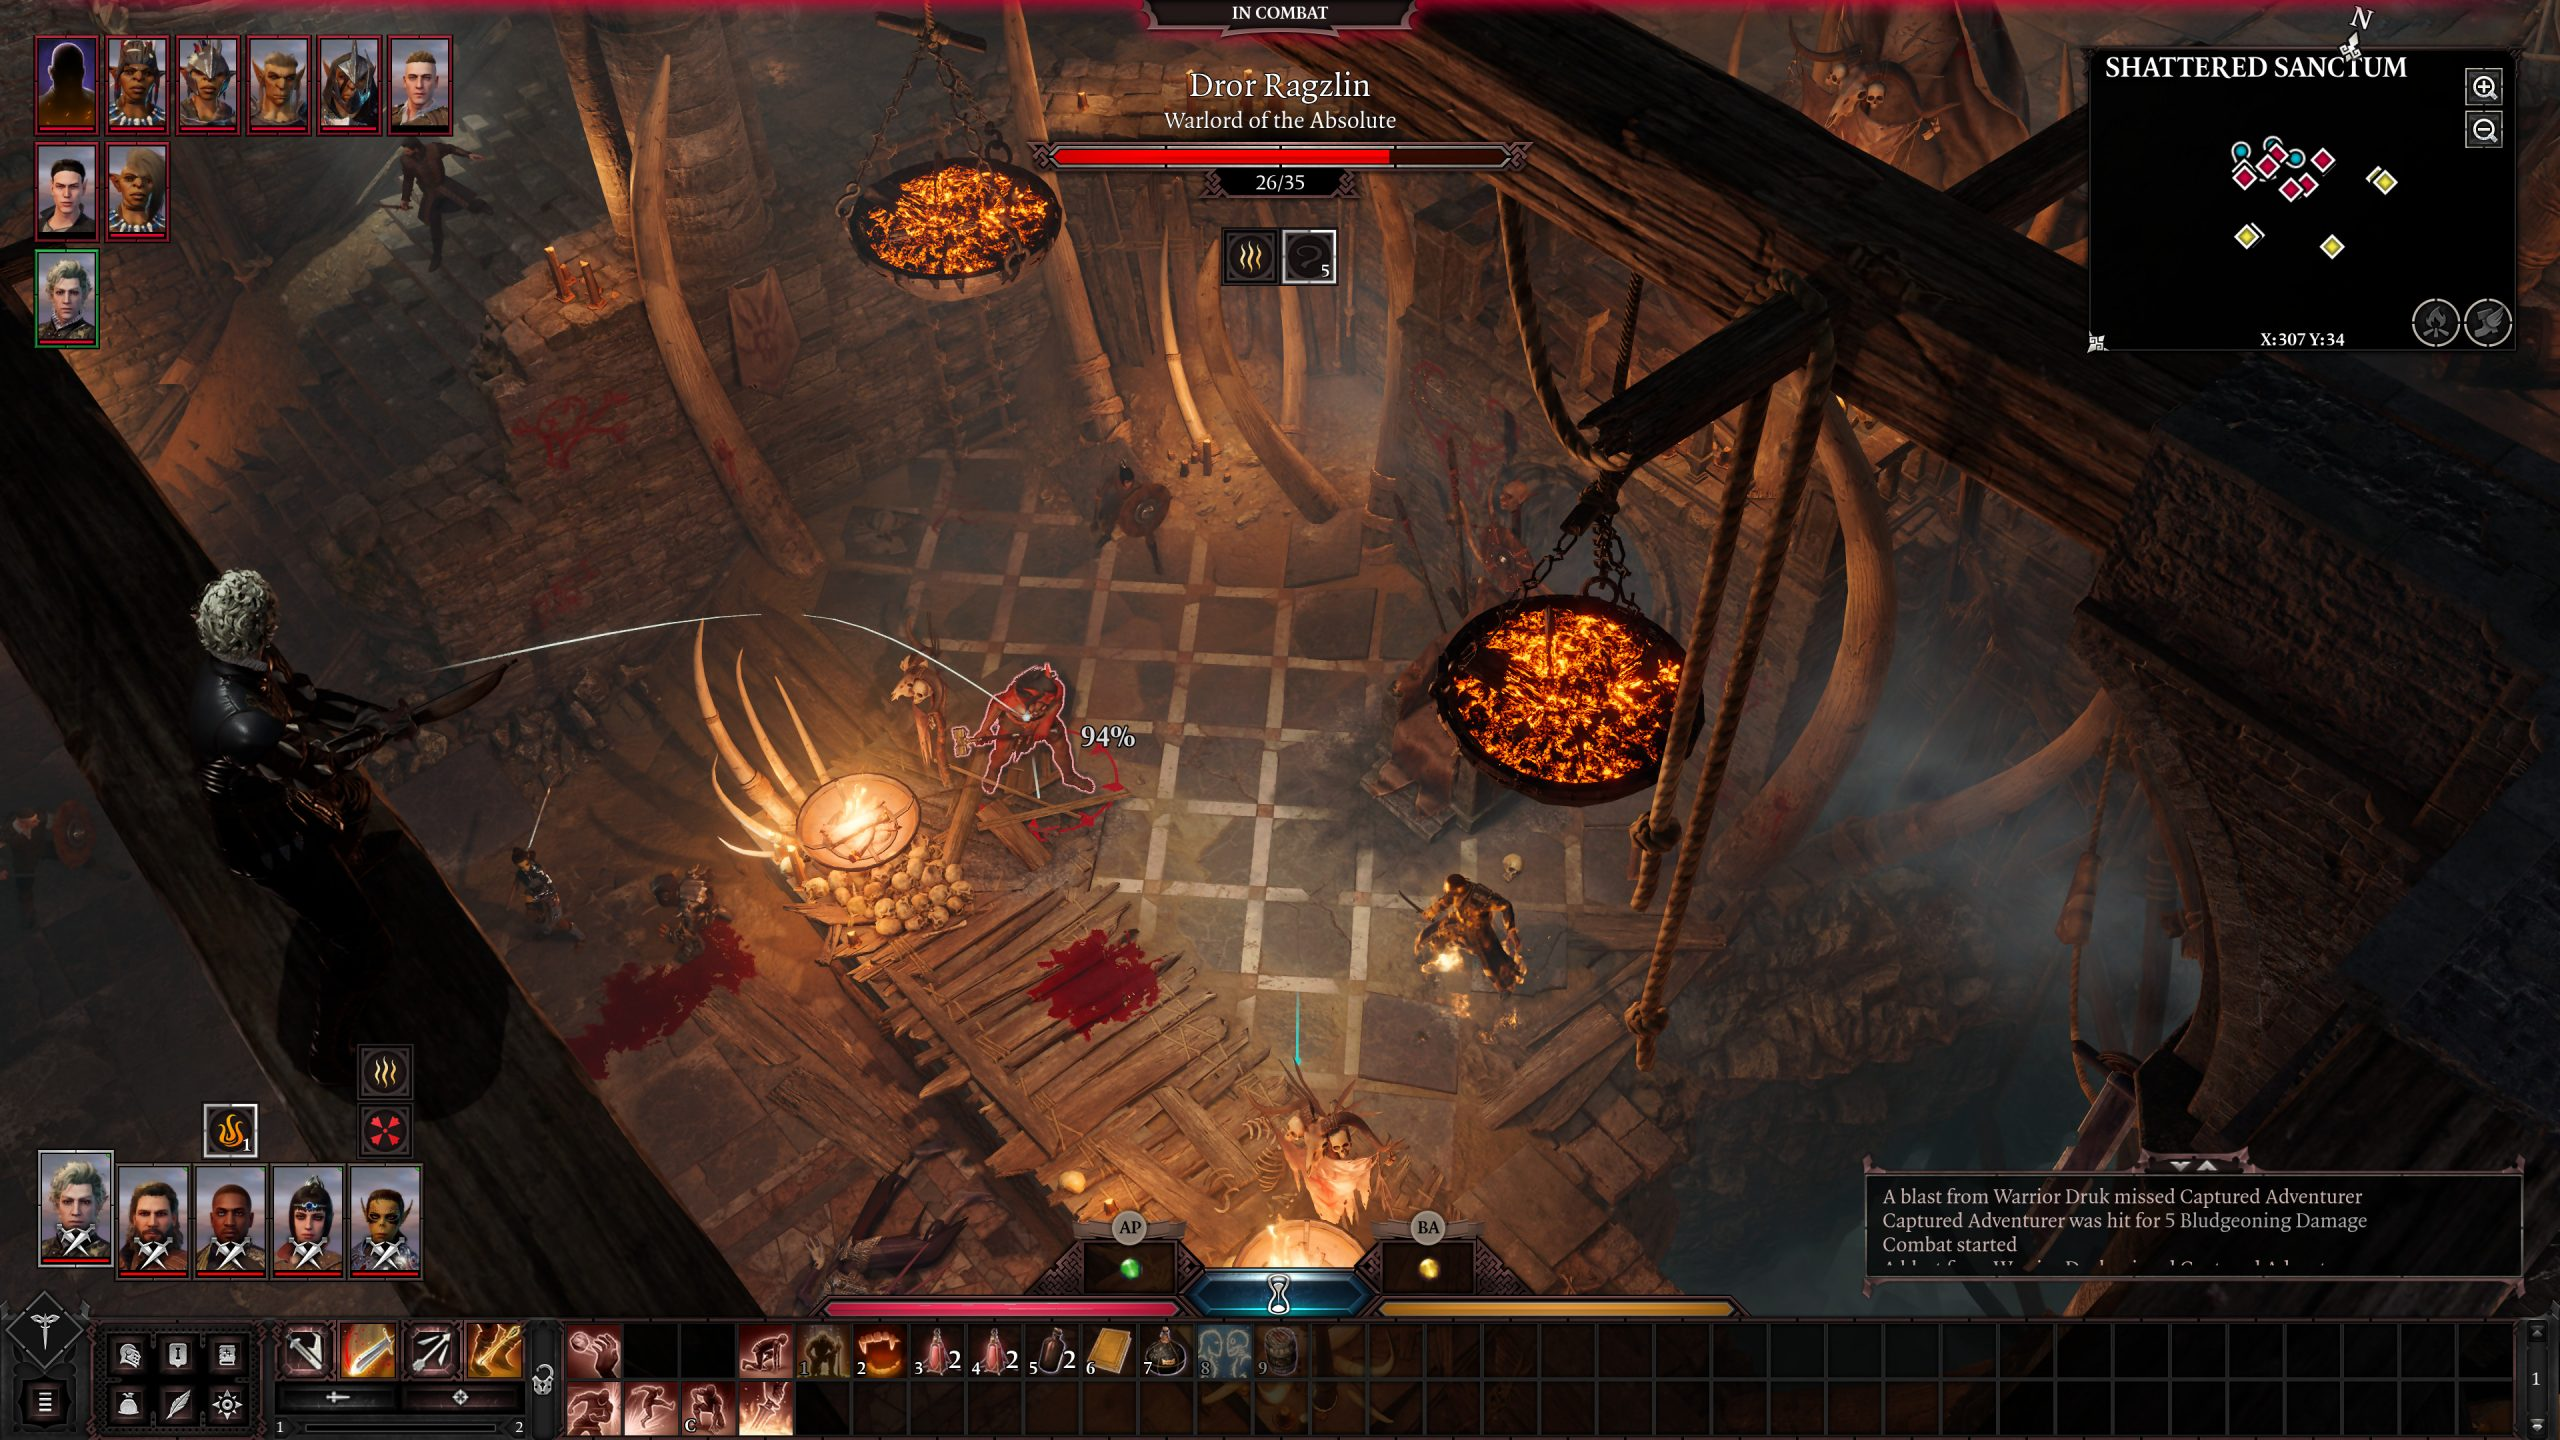 Утечка: скриншоты Baldur's Gate III 6